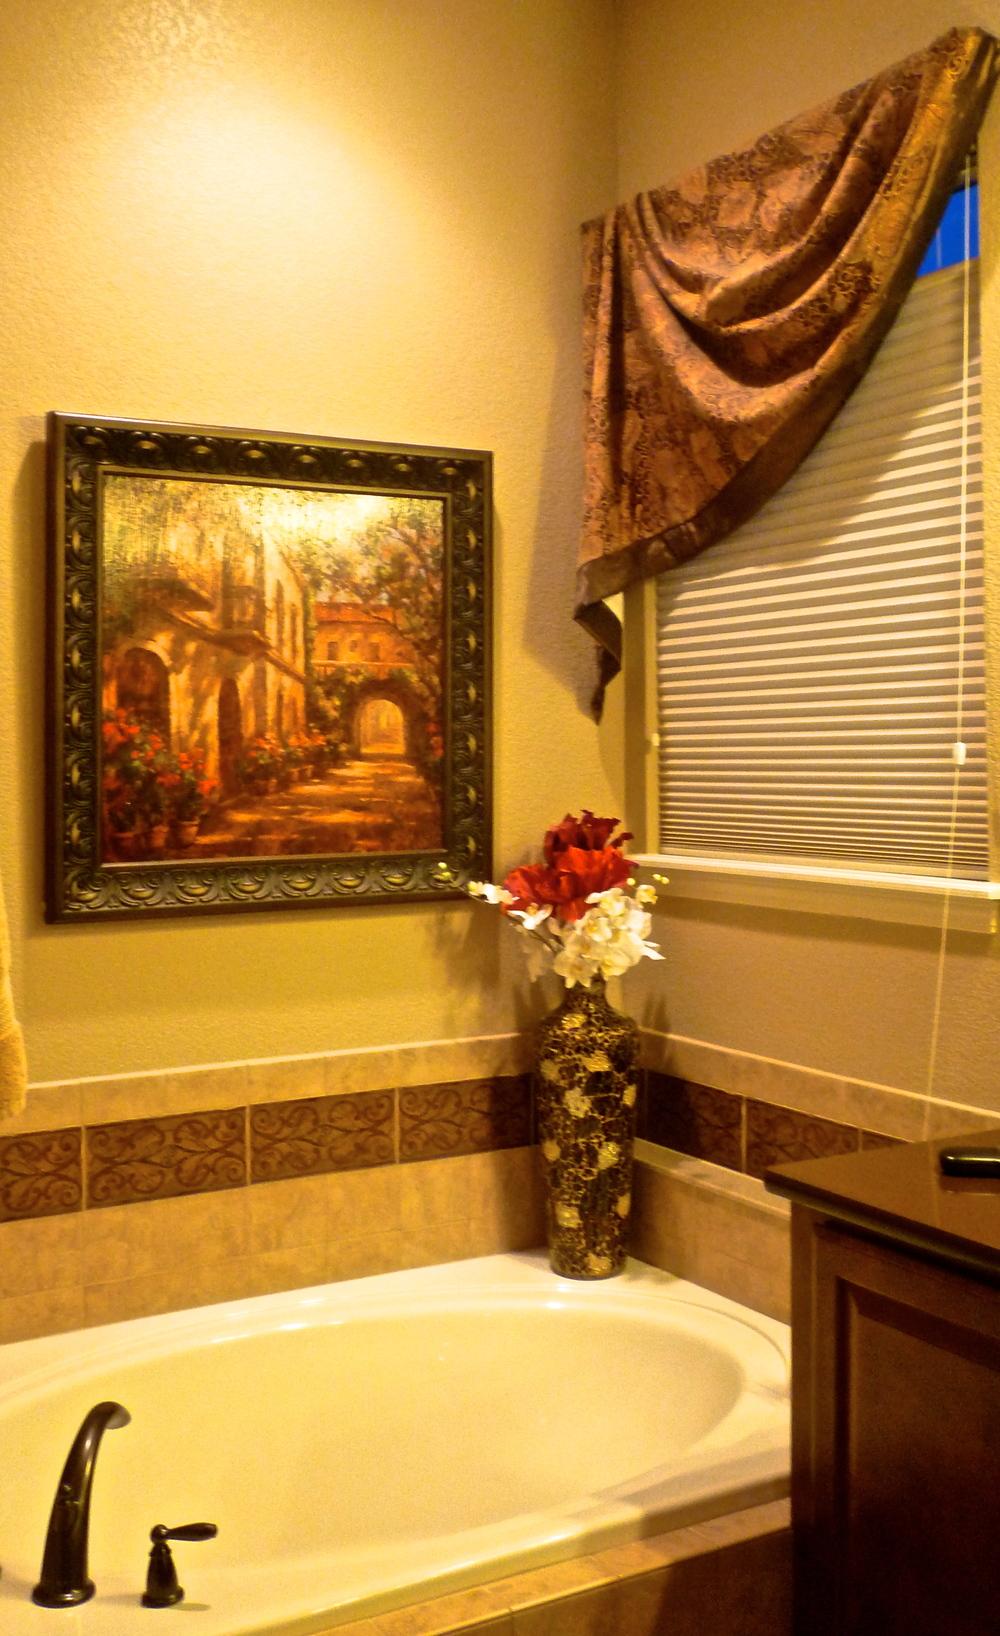 Interior designer colorado springs - 1 Colorado Springs Drapery Interior Design Jpg